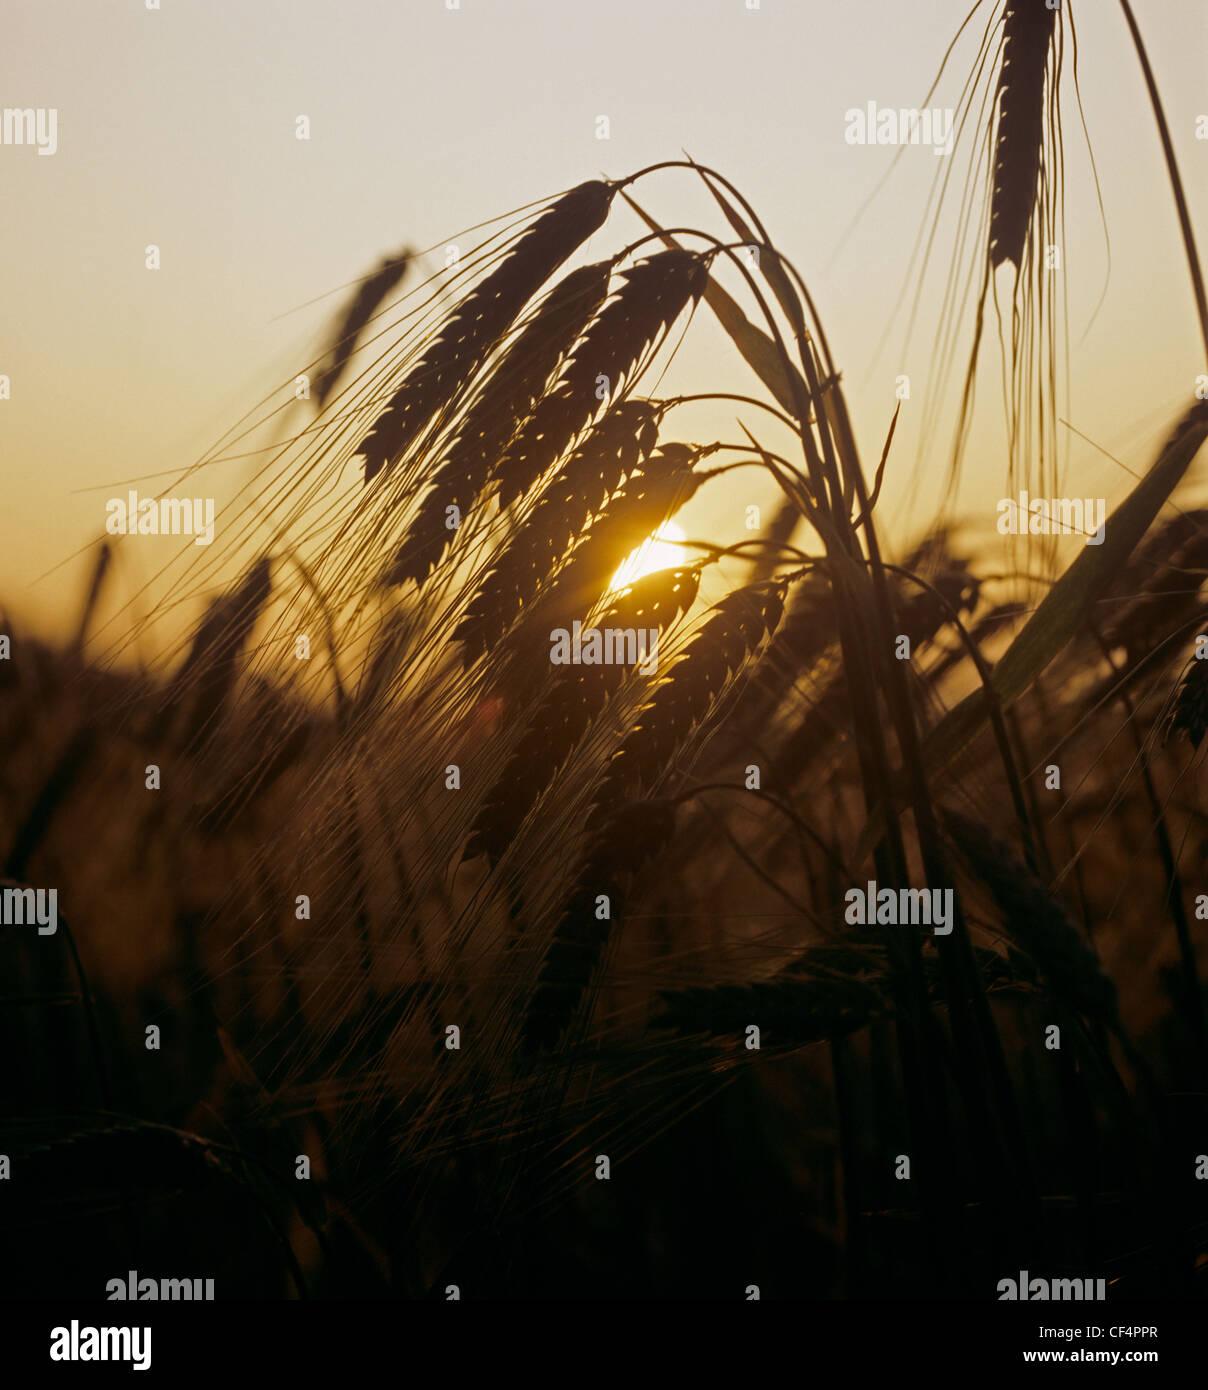 Barley ears against a warm setting summer sun - Stock Image